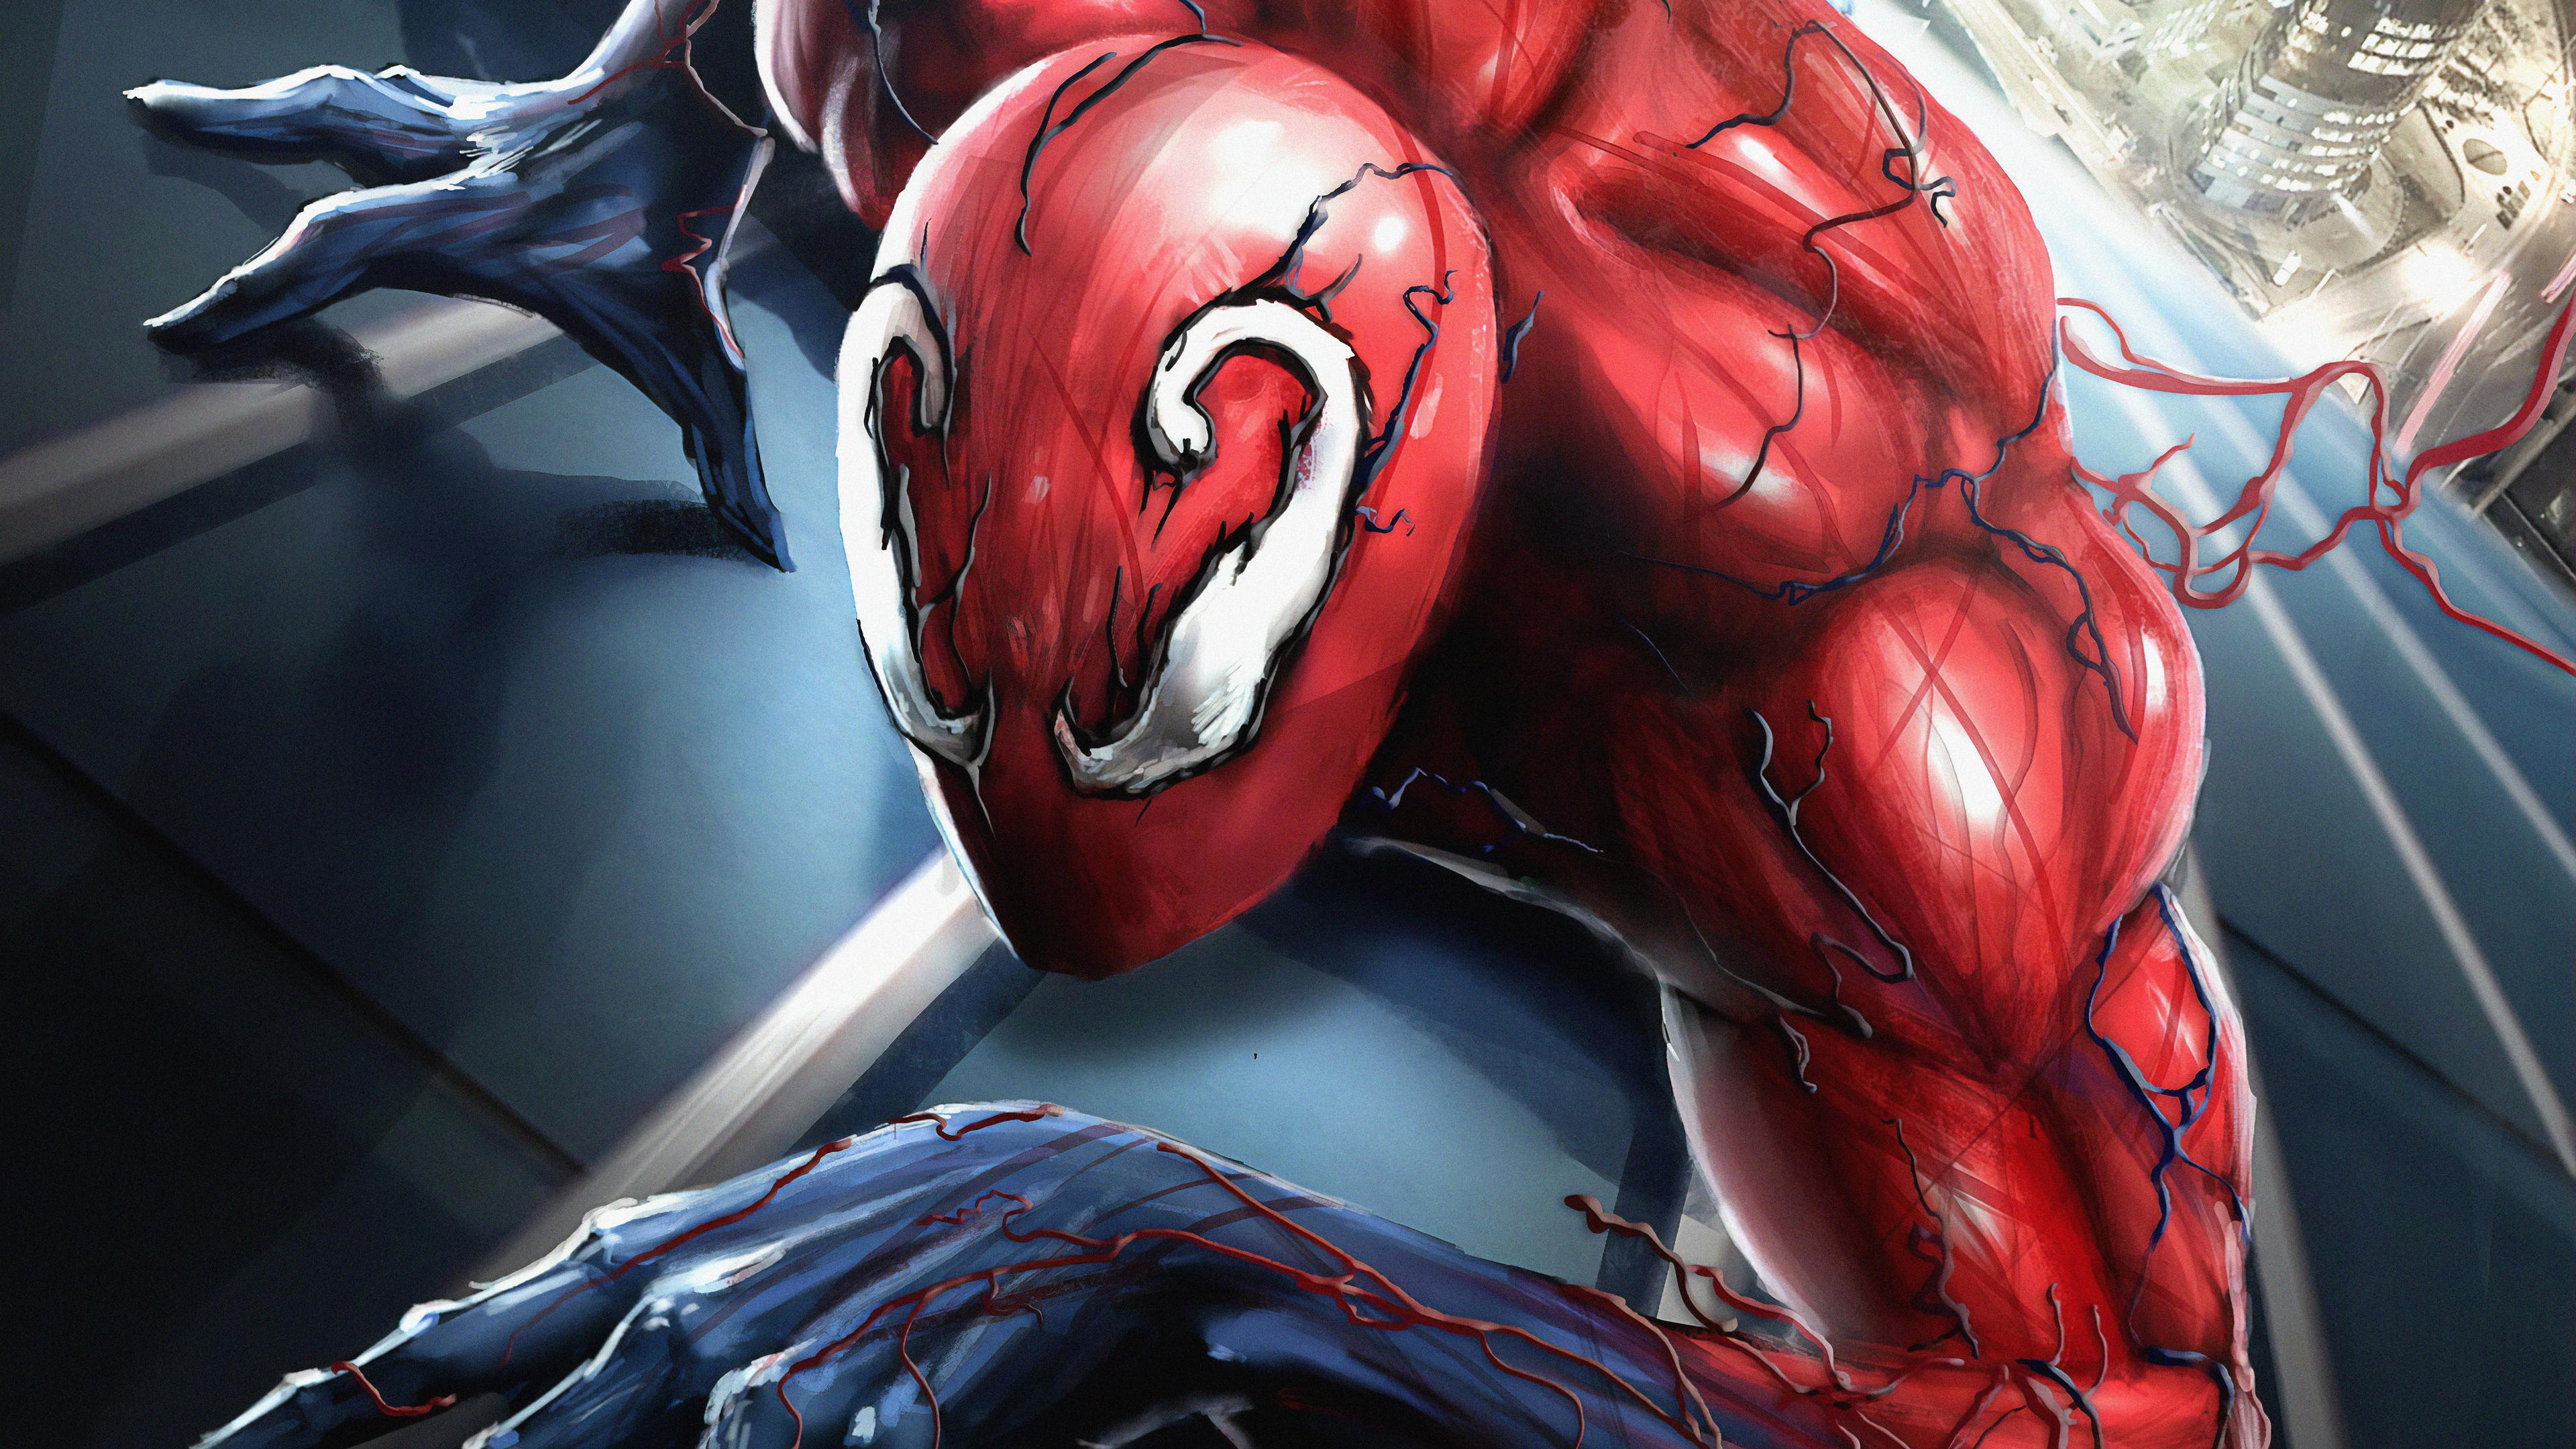 toxic spider 1563220151 - Toxic Spider - superheroes wallpapers, spiderman wallpapers, hd-wallpapers, digital art wallpapers, artwork wallpapers, artstation wallpapers, art wallpapers, 4k-wallpapers